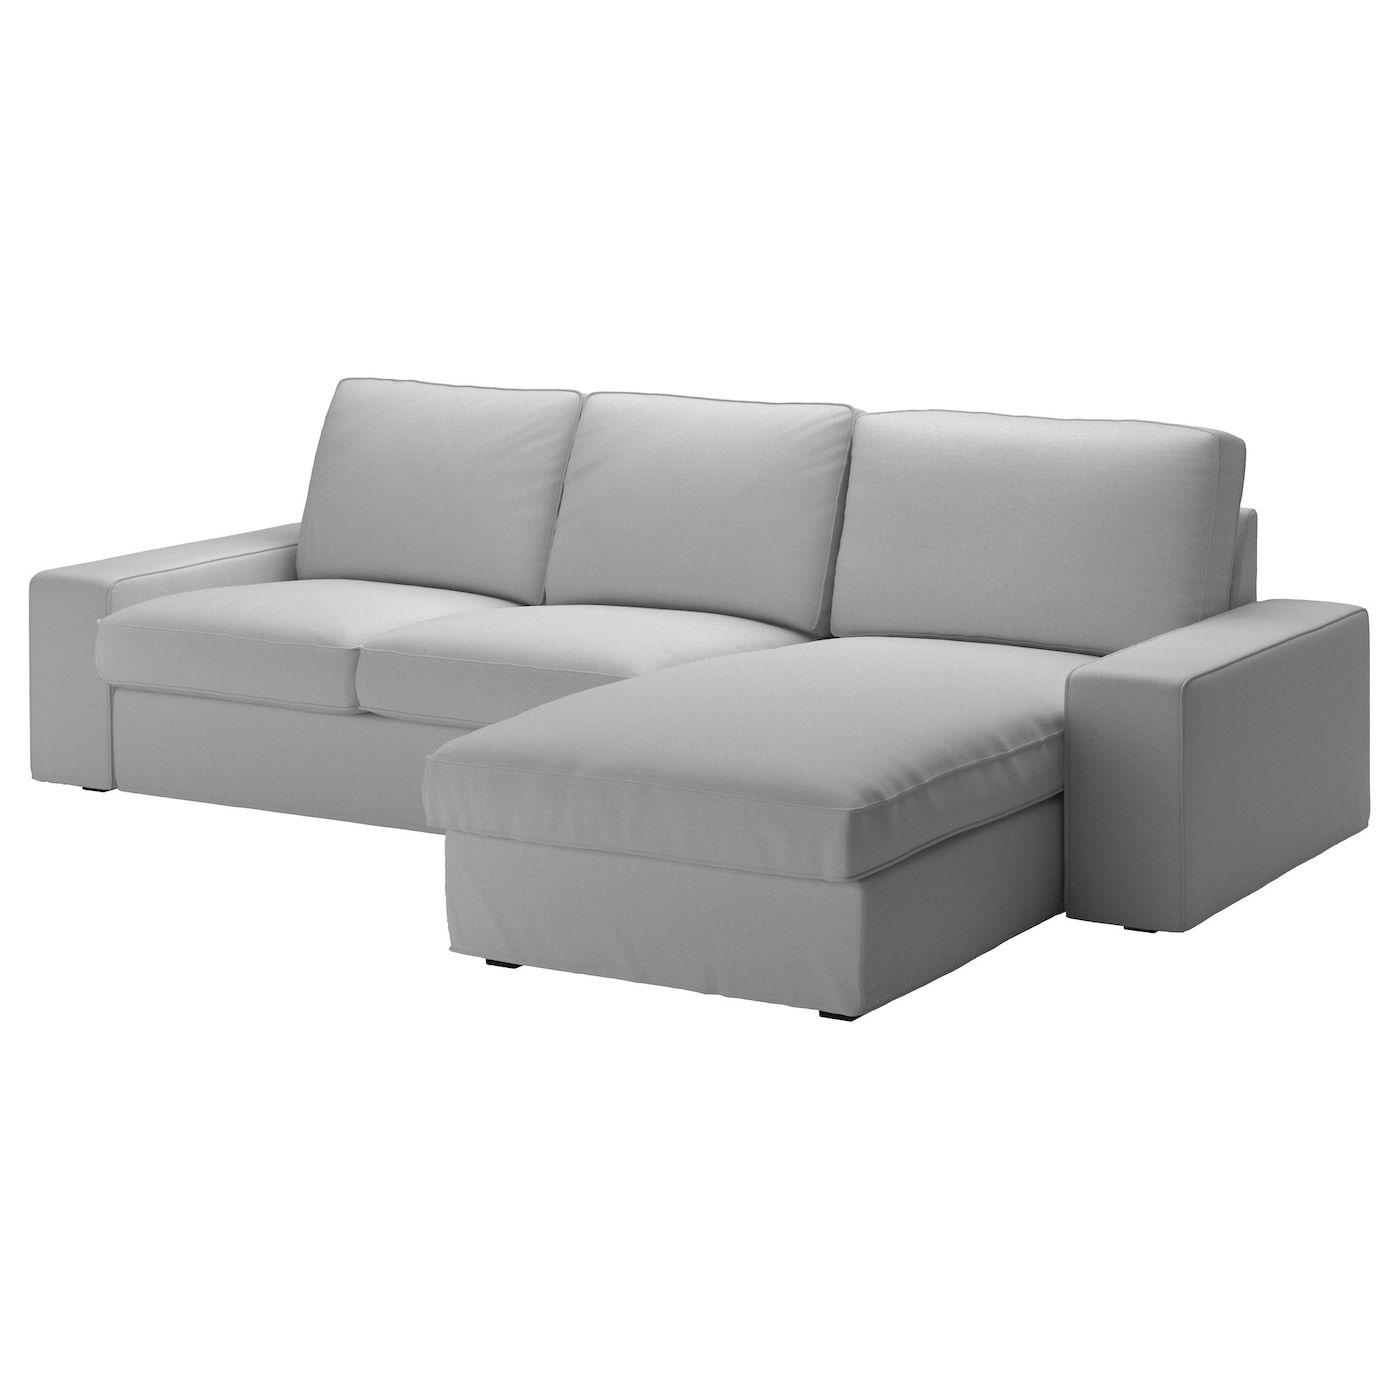 Kivik Sofa With Chaise Orrsta Light Gray Ikea In 2020 Kivik Sofa Couch With Chaise Cheap Sofas